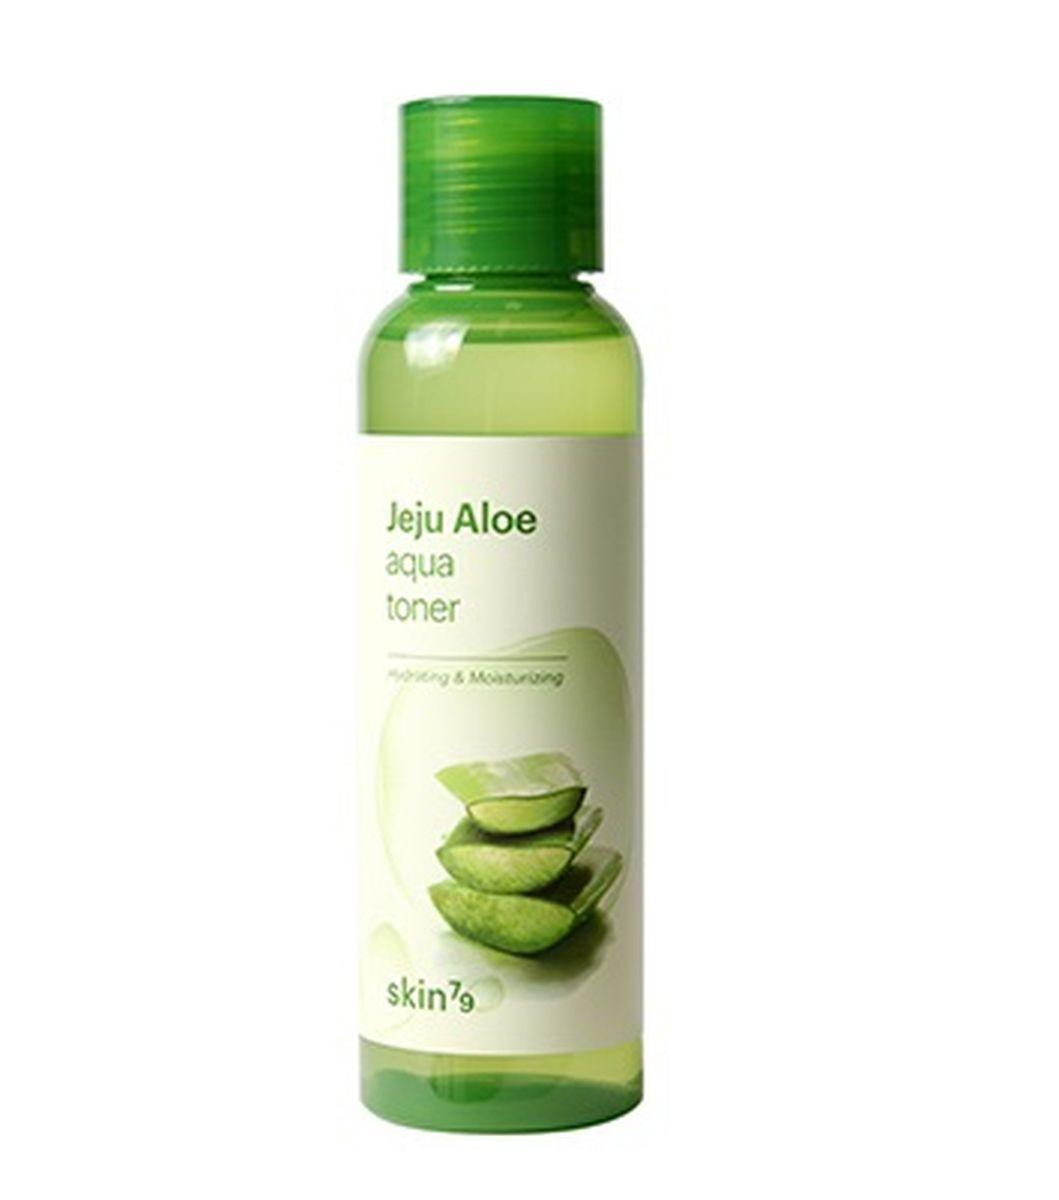 Успокаивающий тонер с алоэ SKIN79 Jeju Aloe Aqua Toner Moisturizing & Soothing - 150 мл